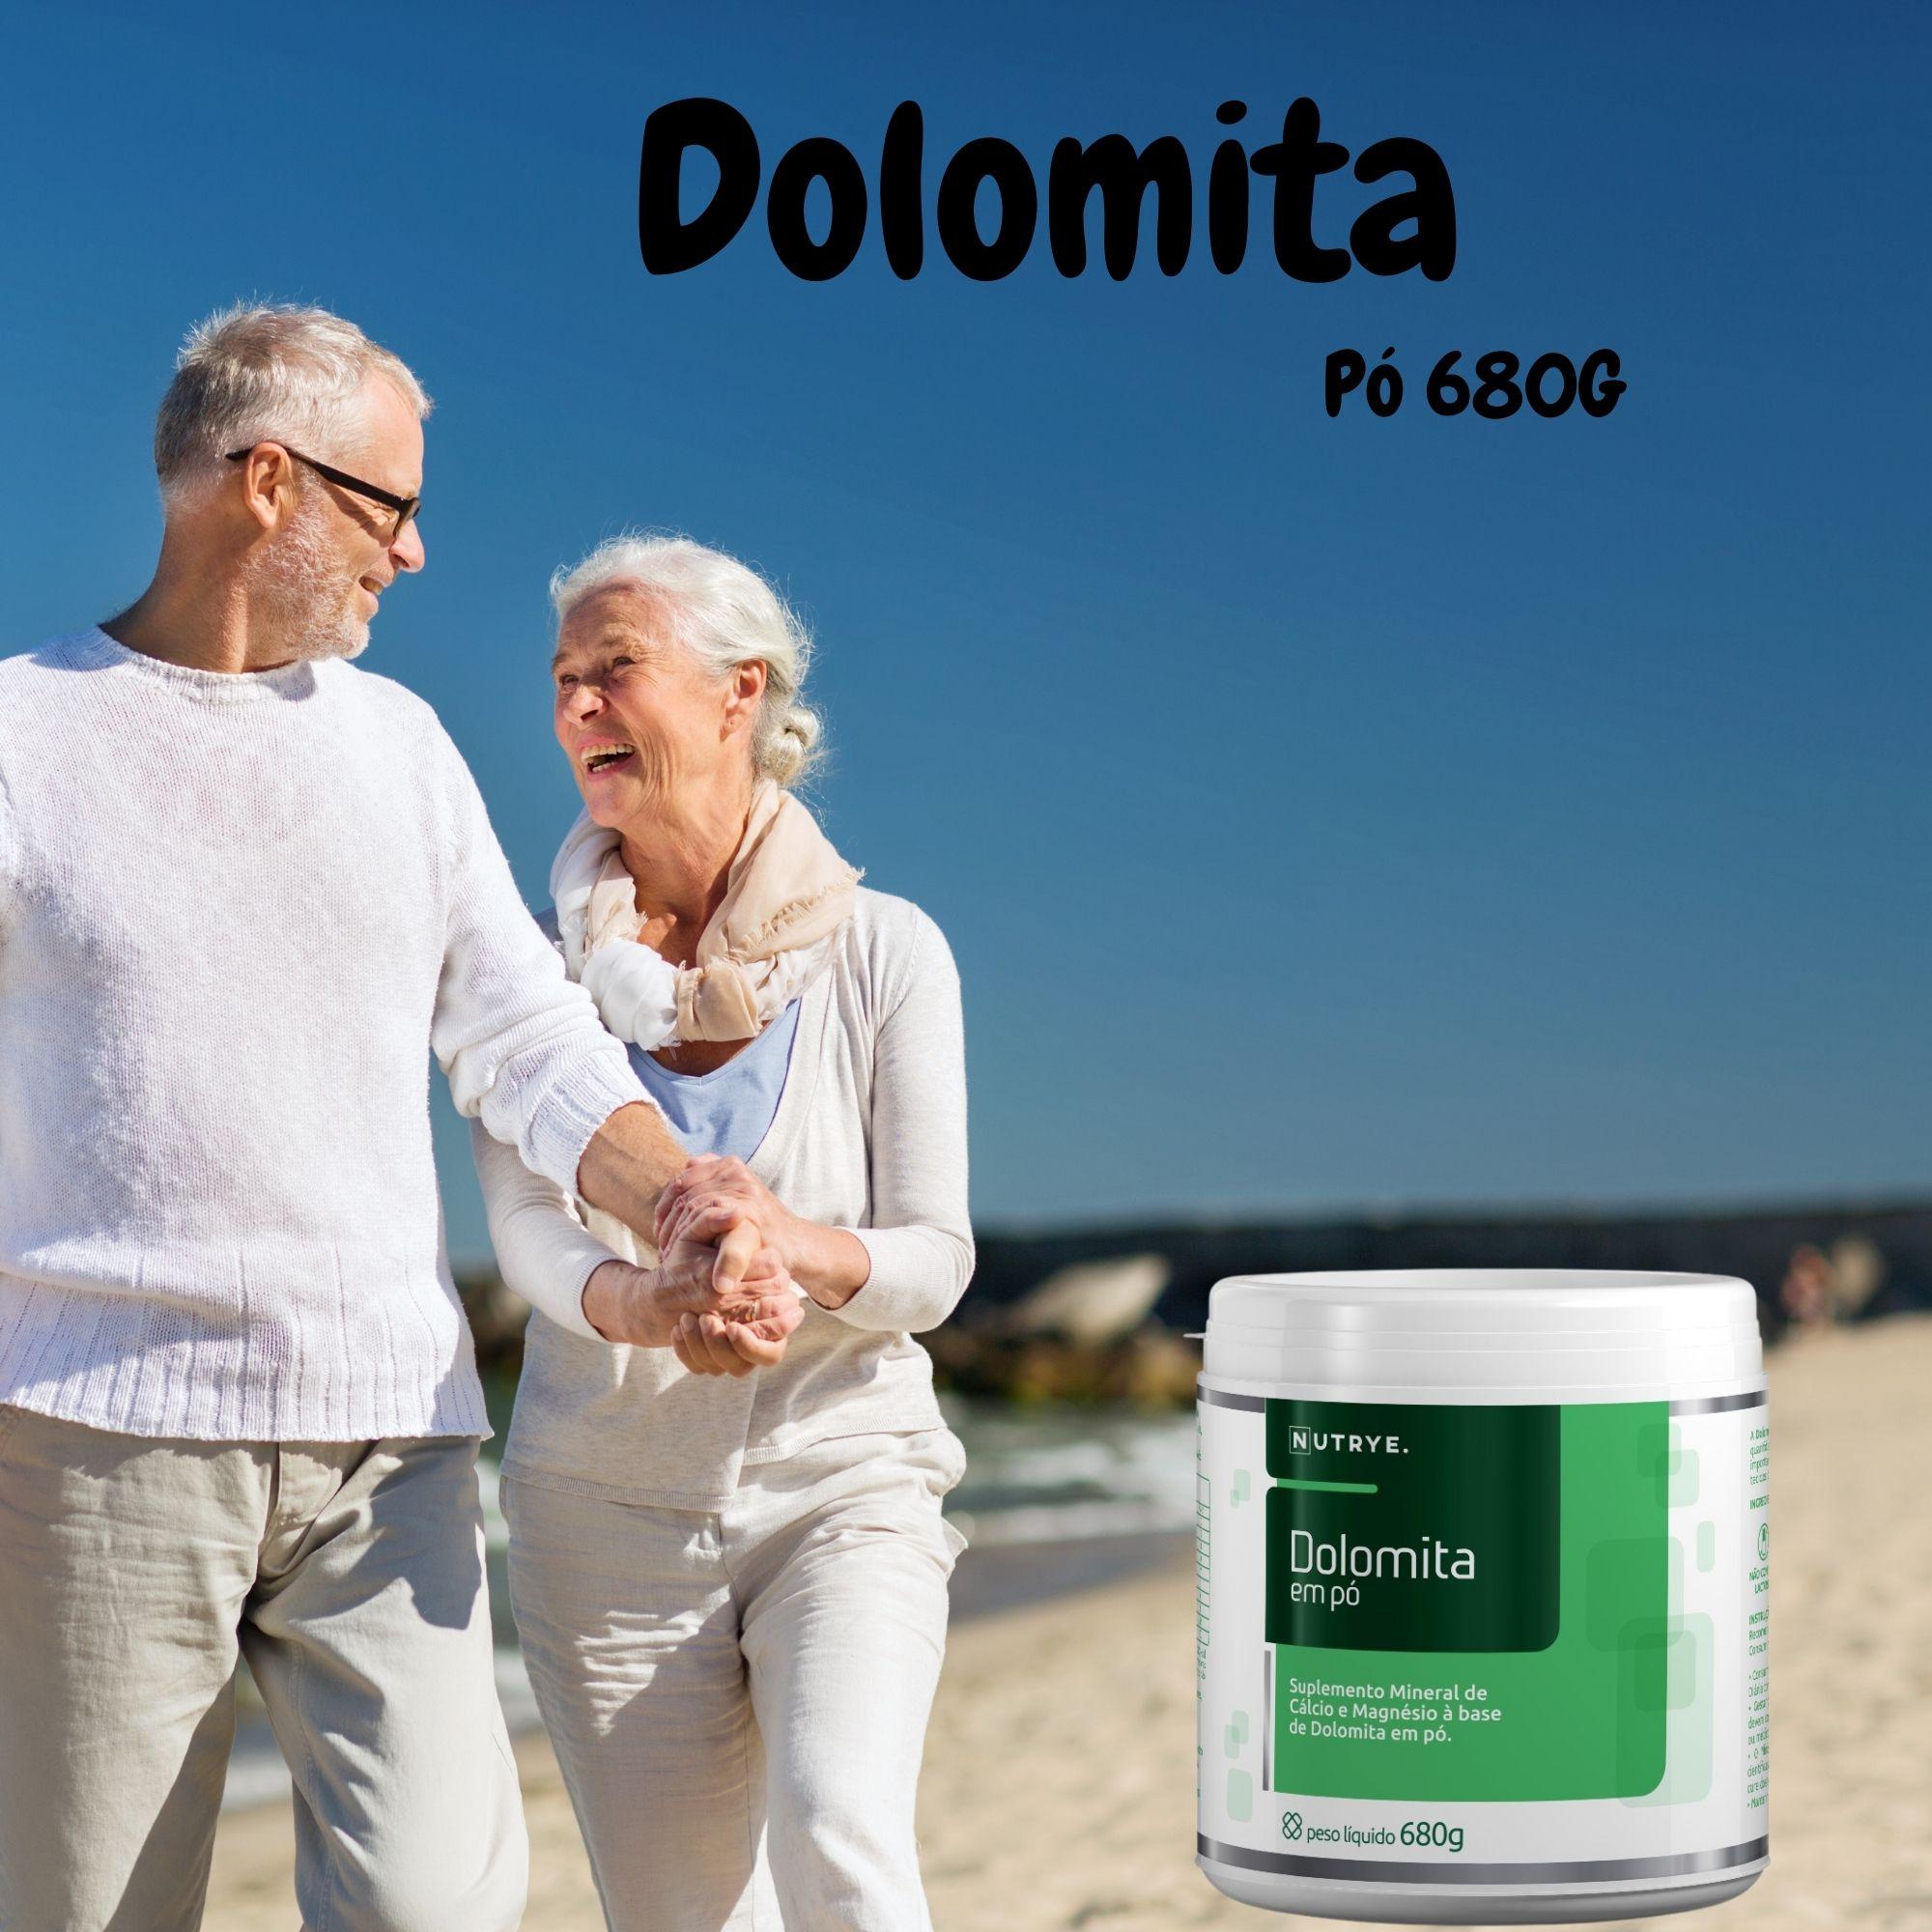 DOLOMITA MINERAL EM PÓ 680G - NUTRYE